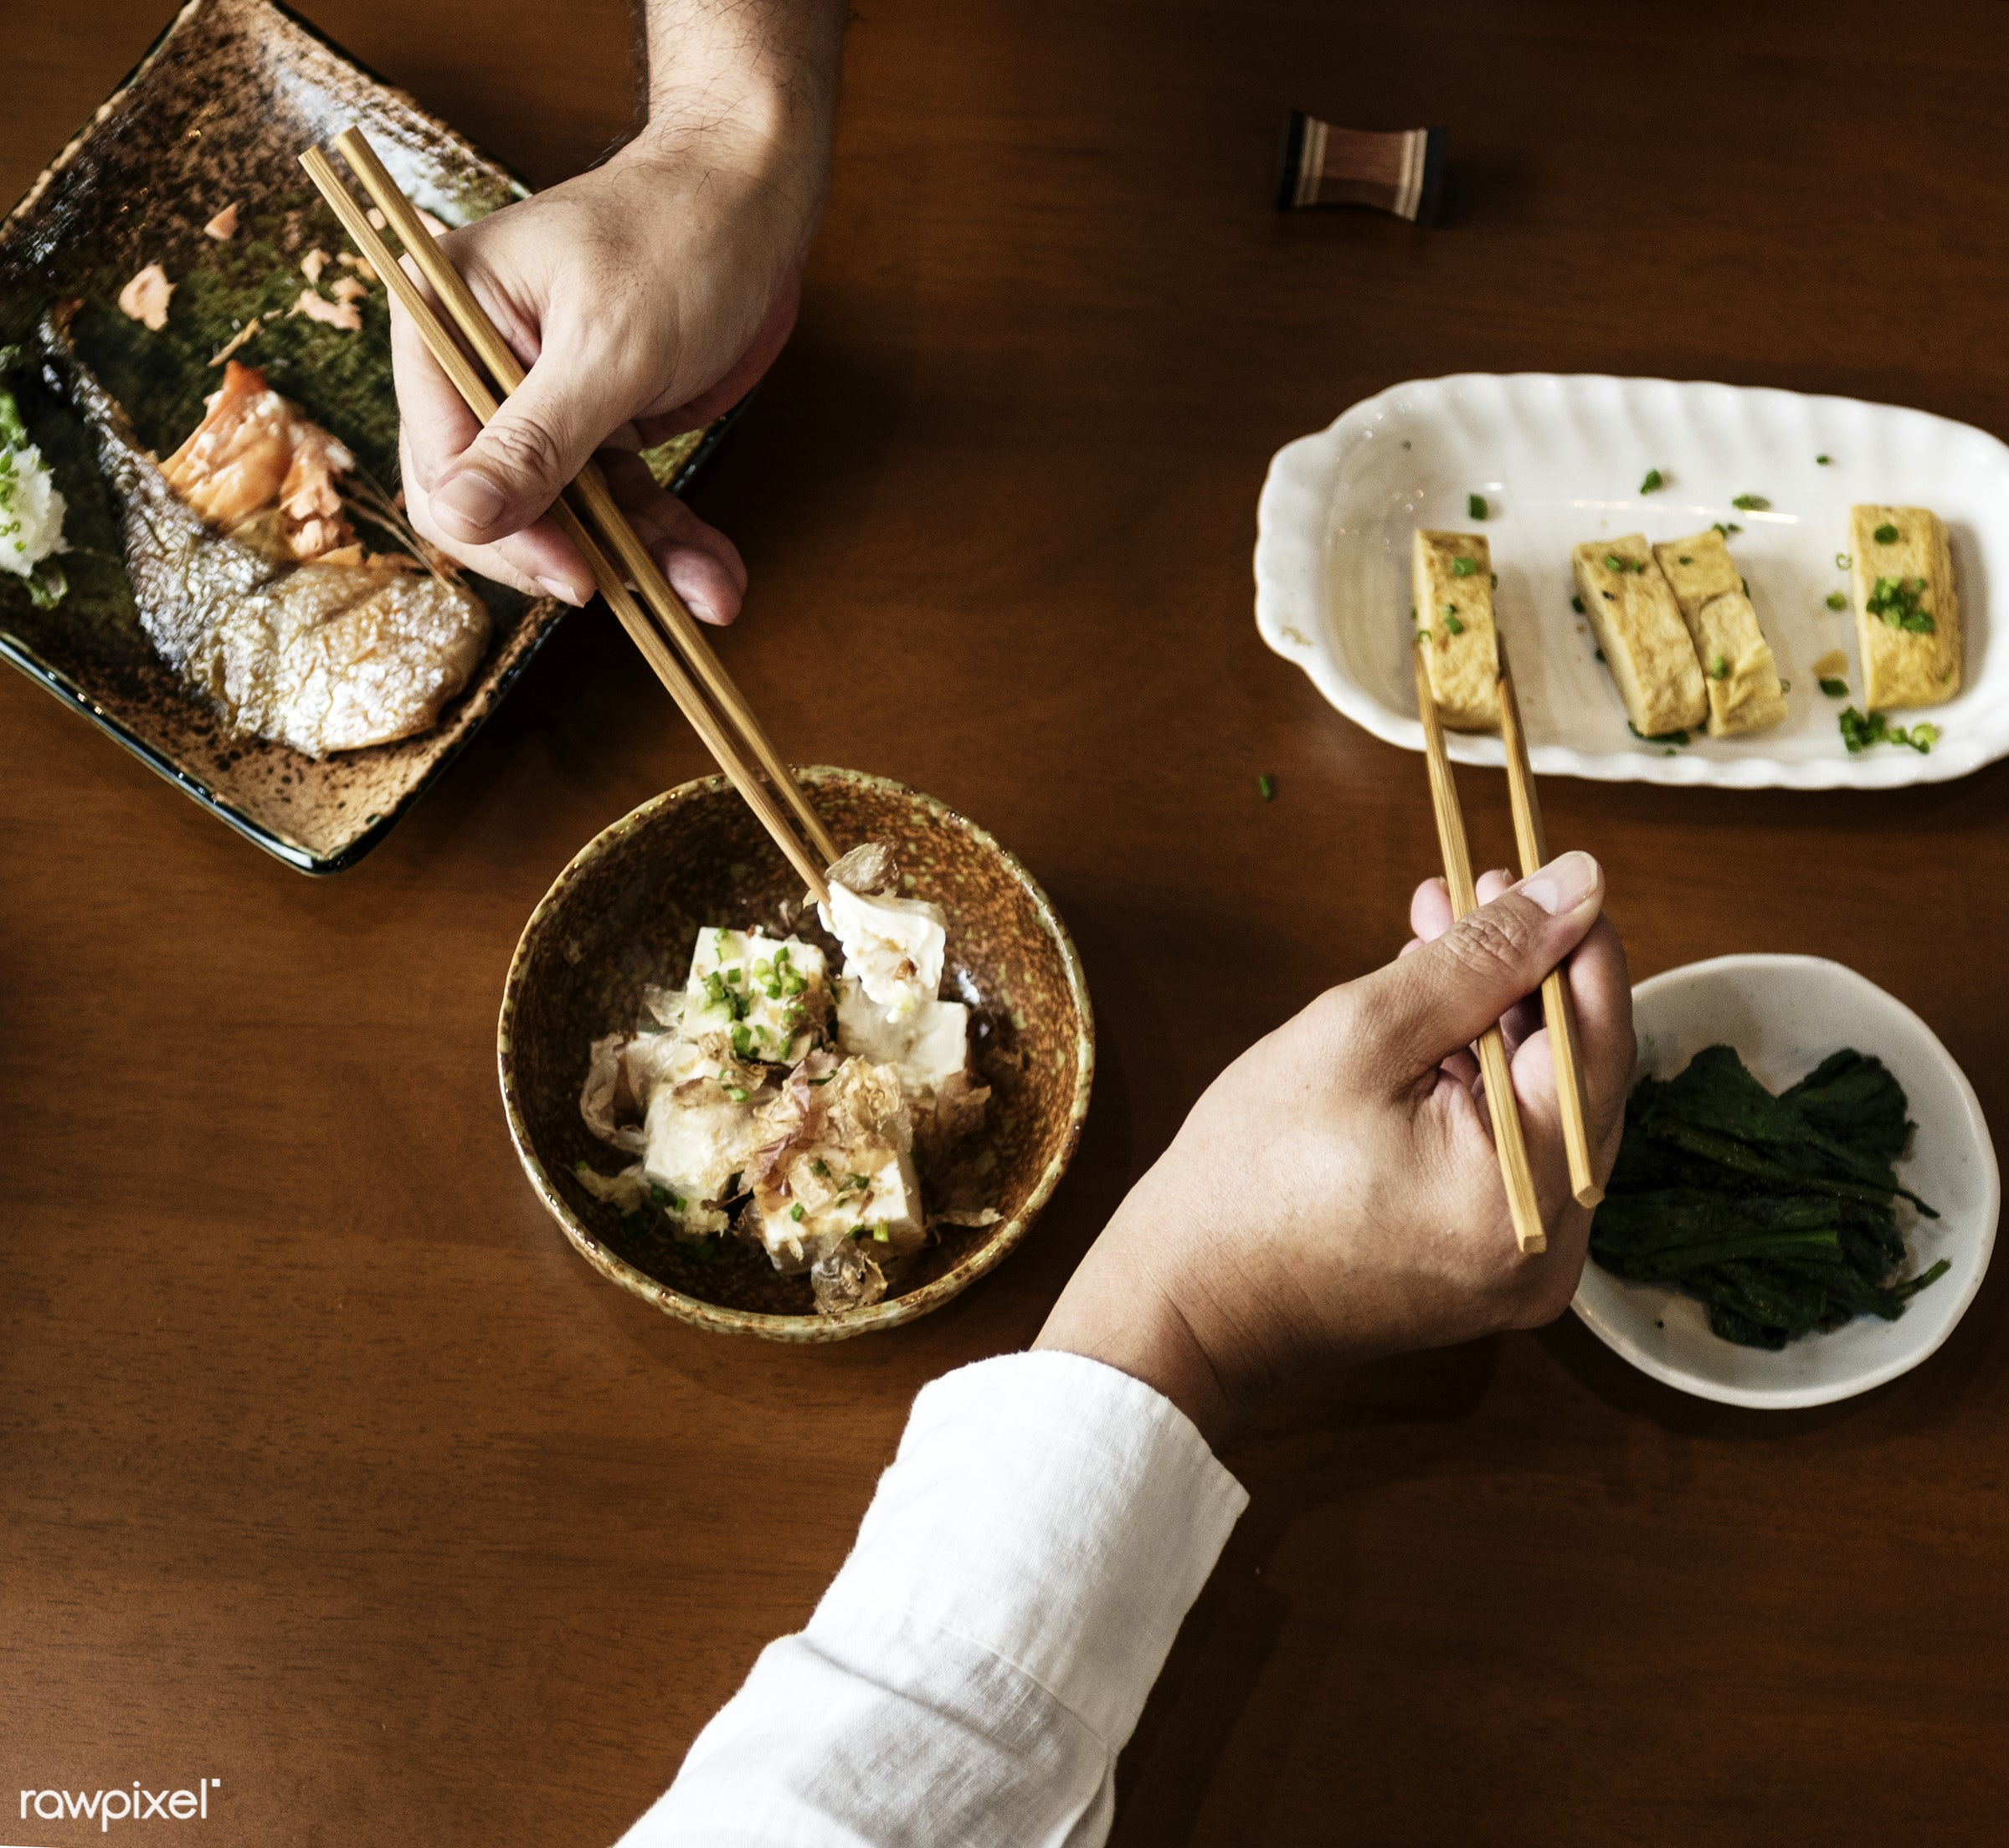 japanese, asian, chopsticks, closeup, combination, cuisine, culture, delicious, dinner, eating, food, fresh, gourmet,...